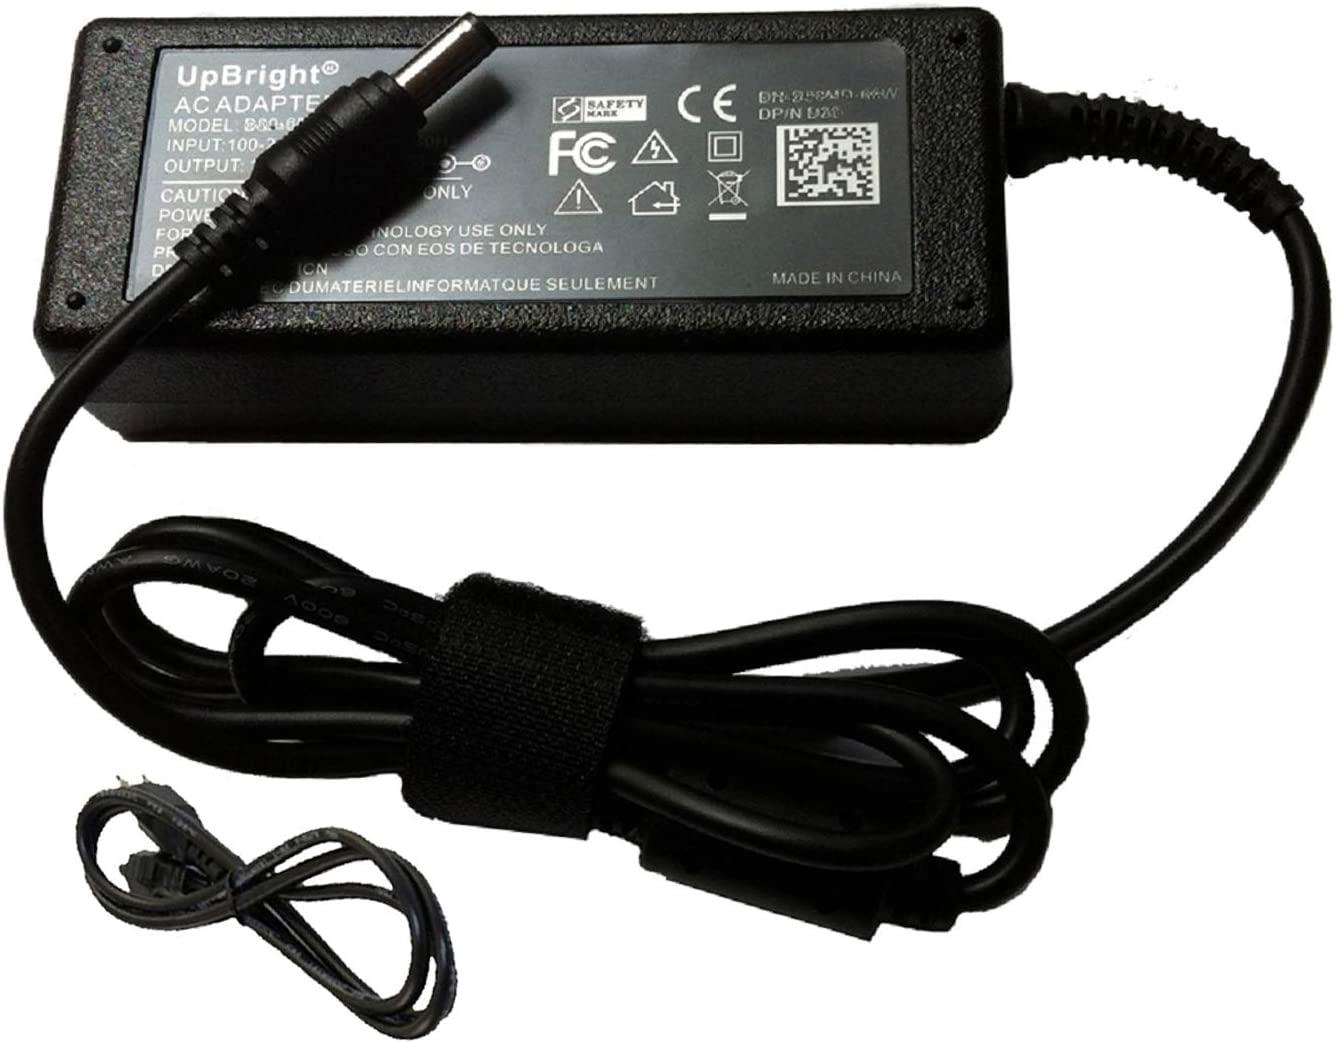 Laptop Ac Adapter Charger Power Cord Supply for Samsung NP300E5E-A01US NP300E5E-A02US NP300E5E-A05CA NP-R540-JA06US R540-JA07